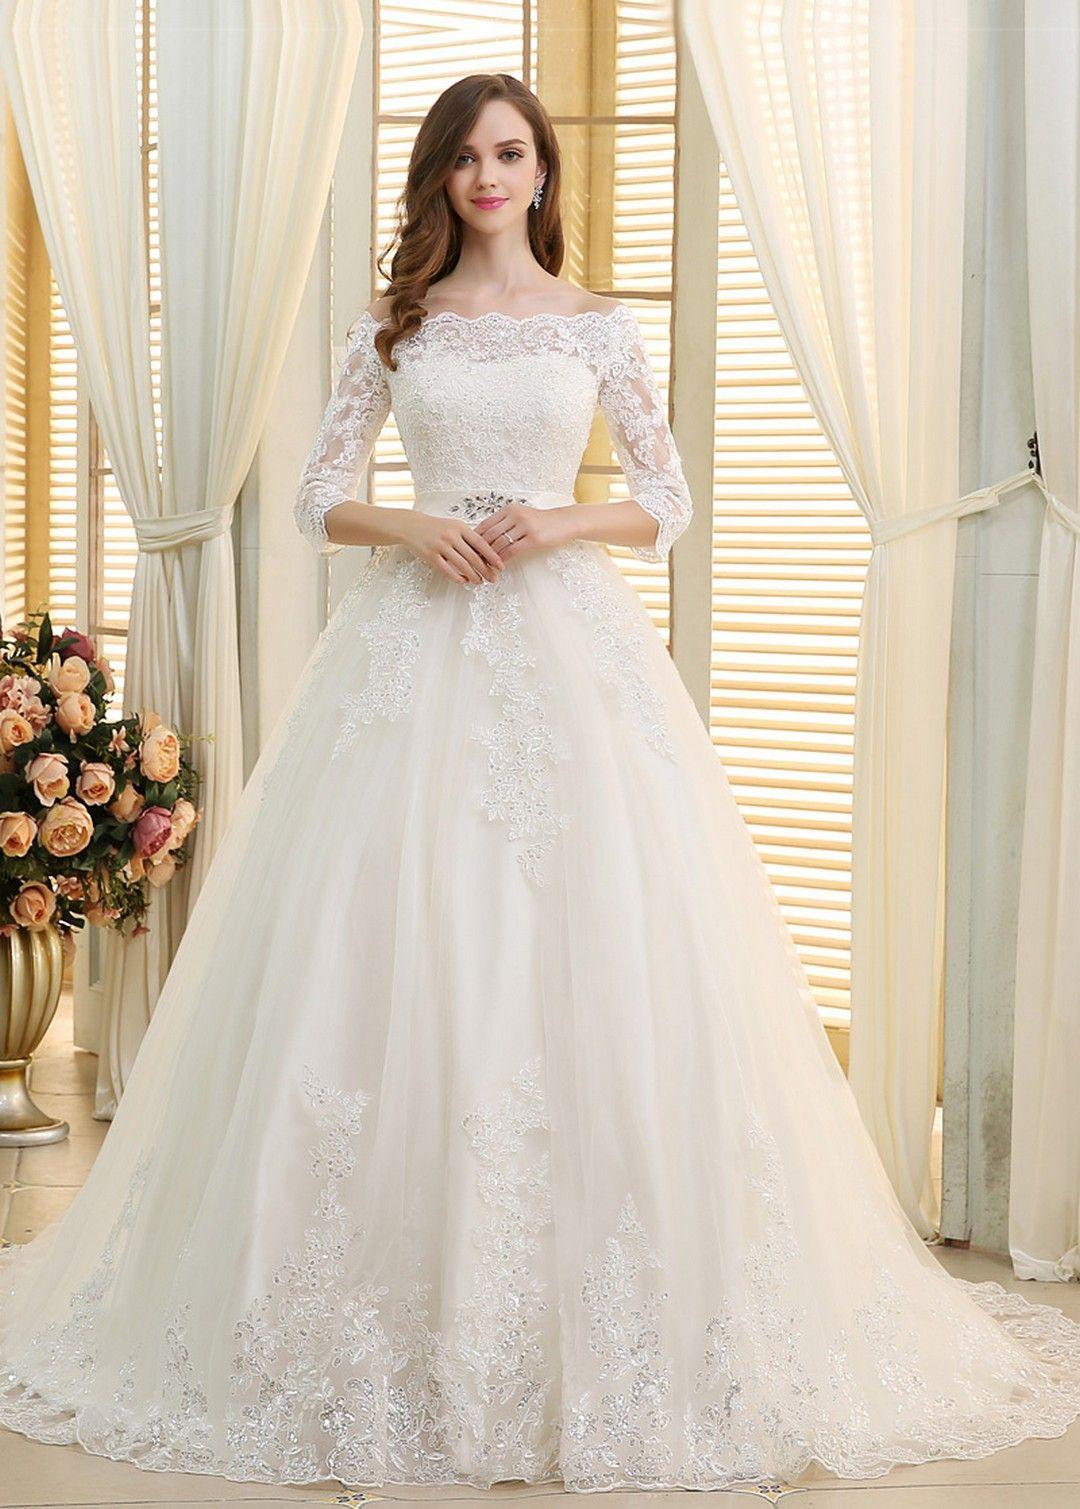 41++ Princess style wedding dress ideas info